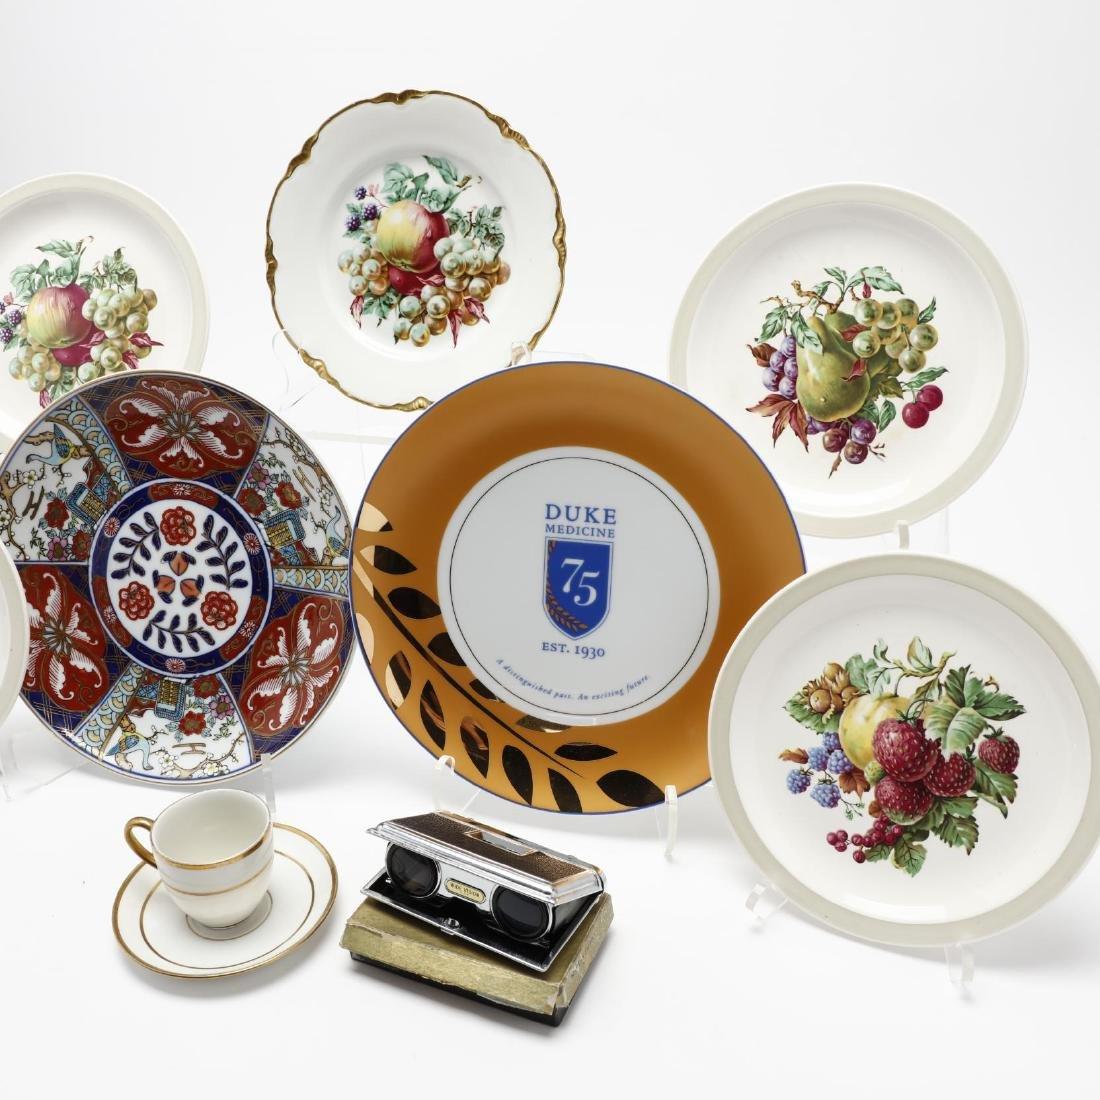 Assorted Vintage Porcelain and Opera Glasses - 3